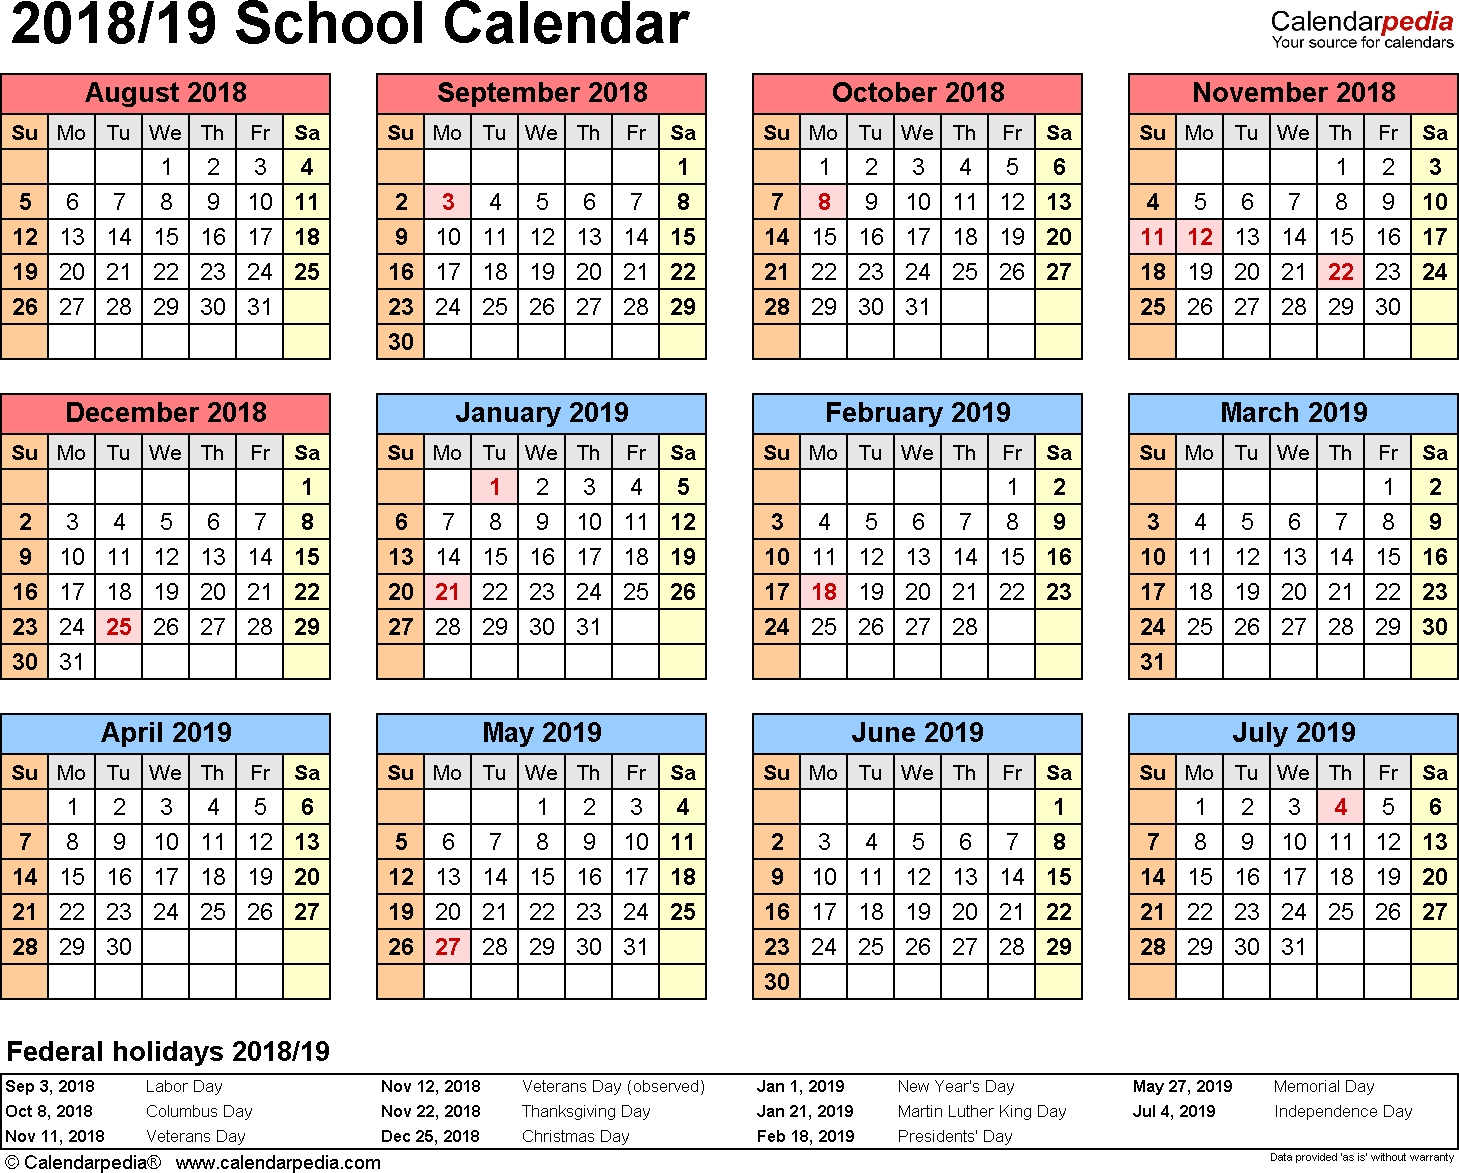 School Calendars 2018/2019 As Free Printable Word Templates-Unit 4 Unit 4 Calendar 2019